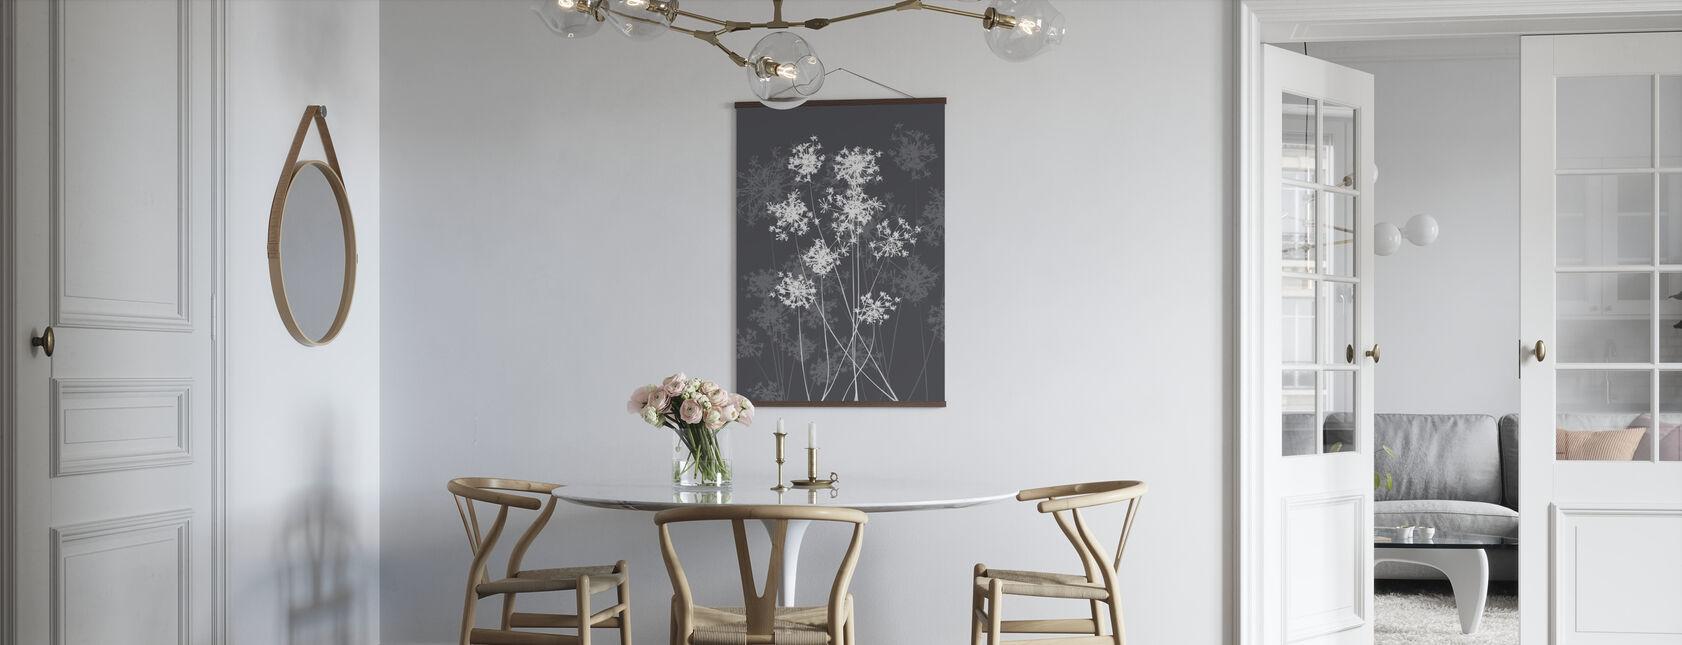 Dandelions - Grey - Poster - Kitchen